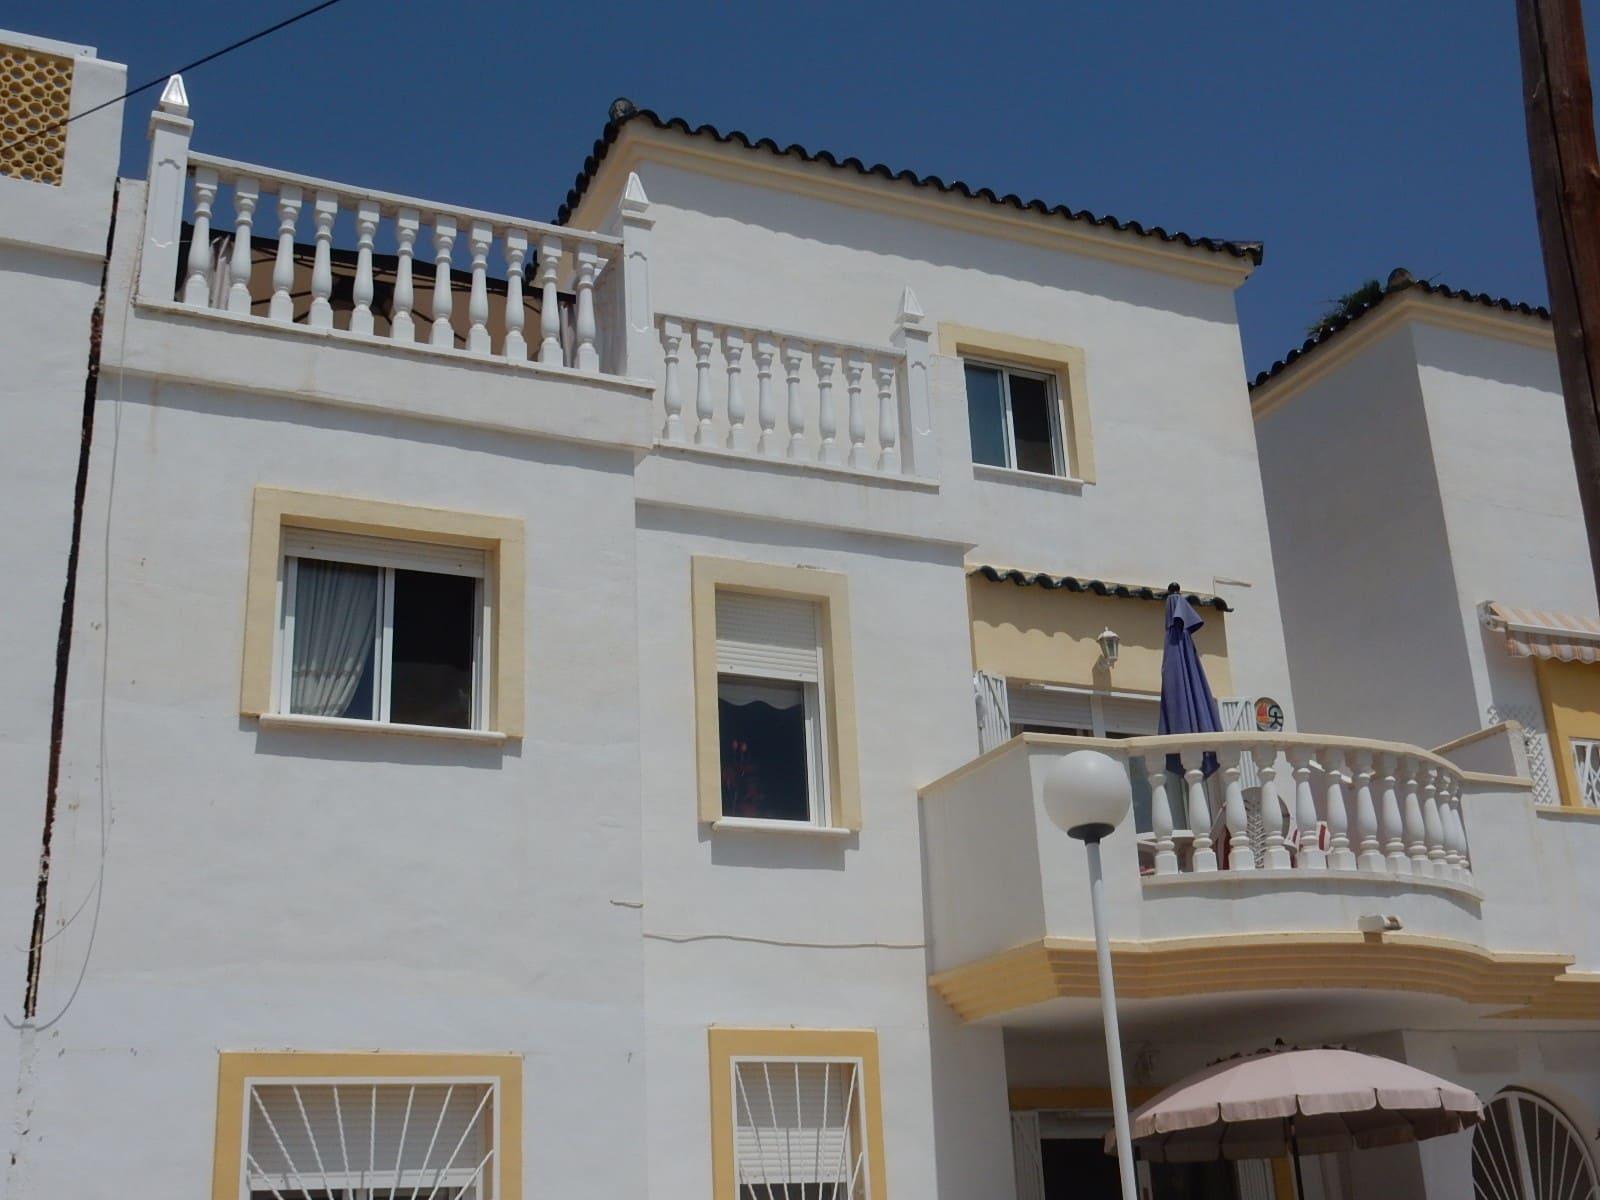 3 bedroom Apartment for sale in Ciudad Quesada with pool - € 88,000 (Ref: 4788323)